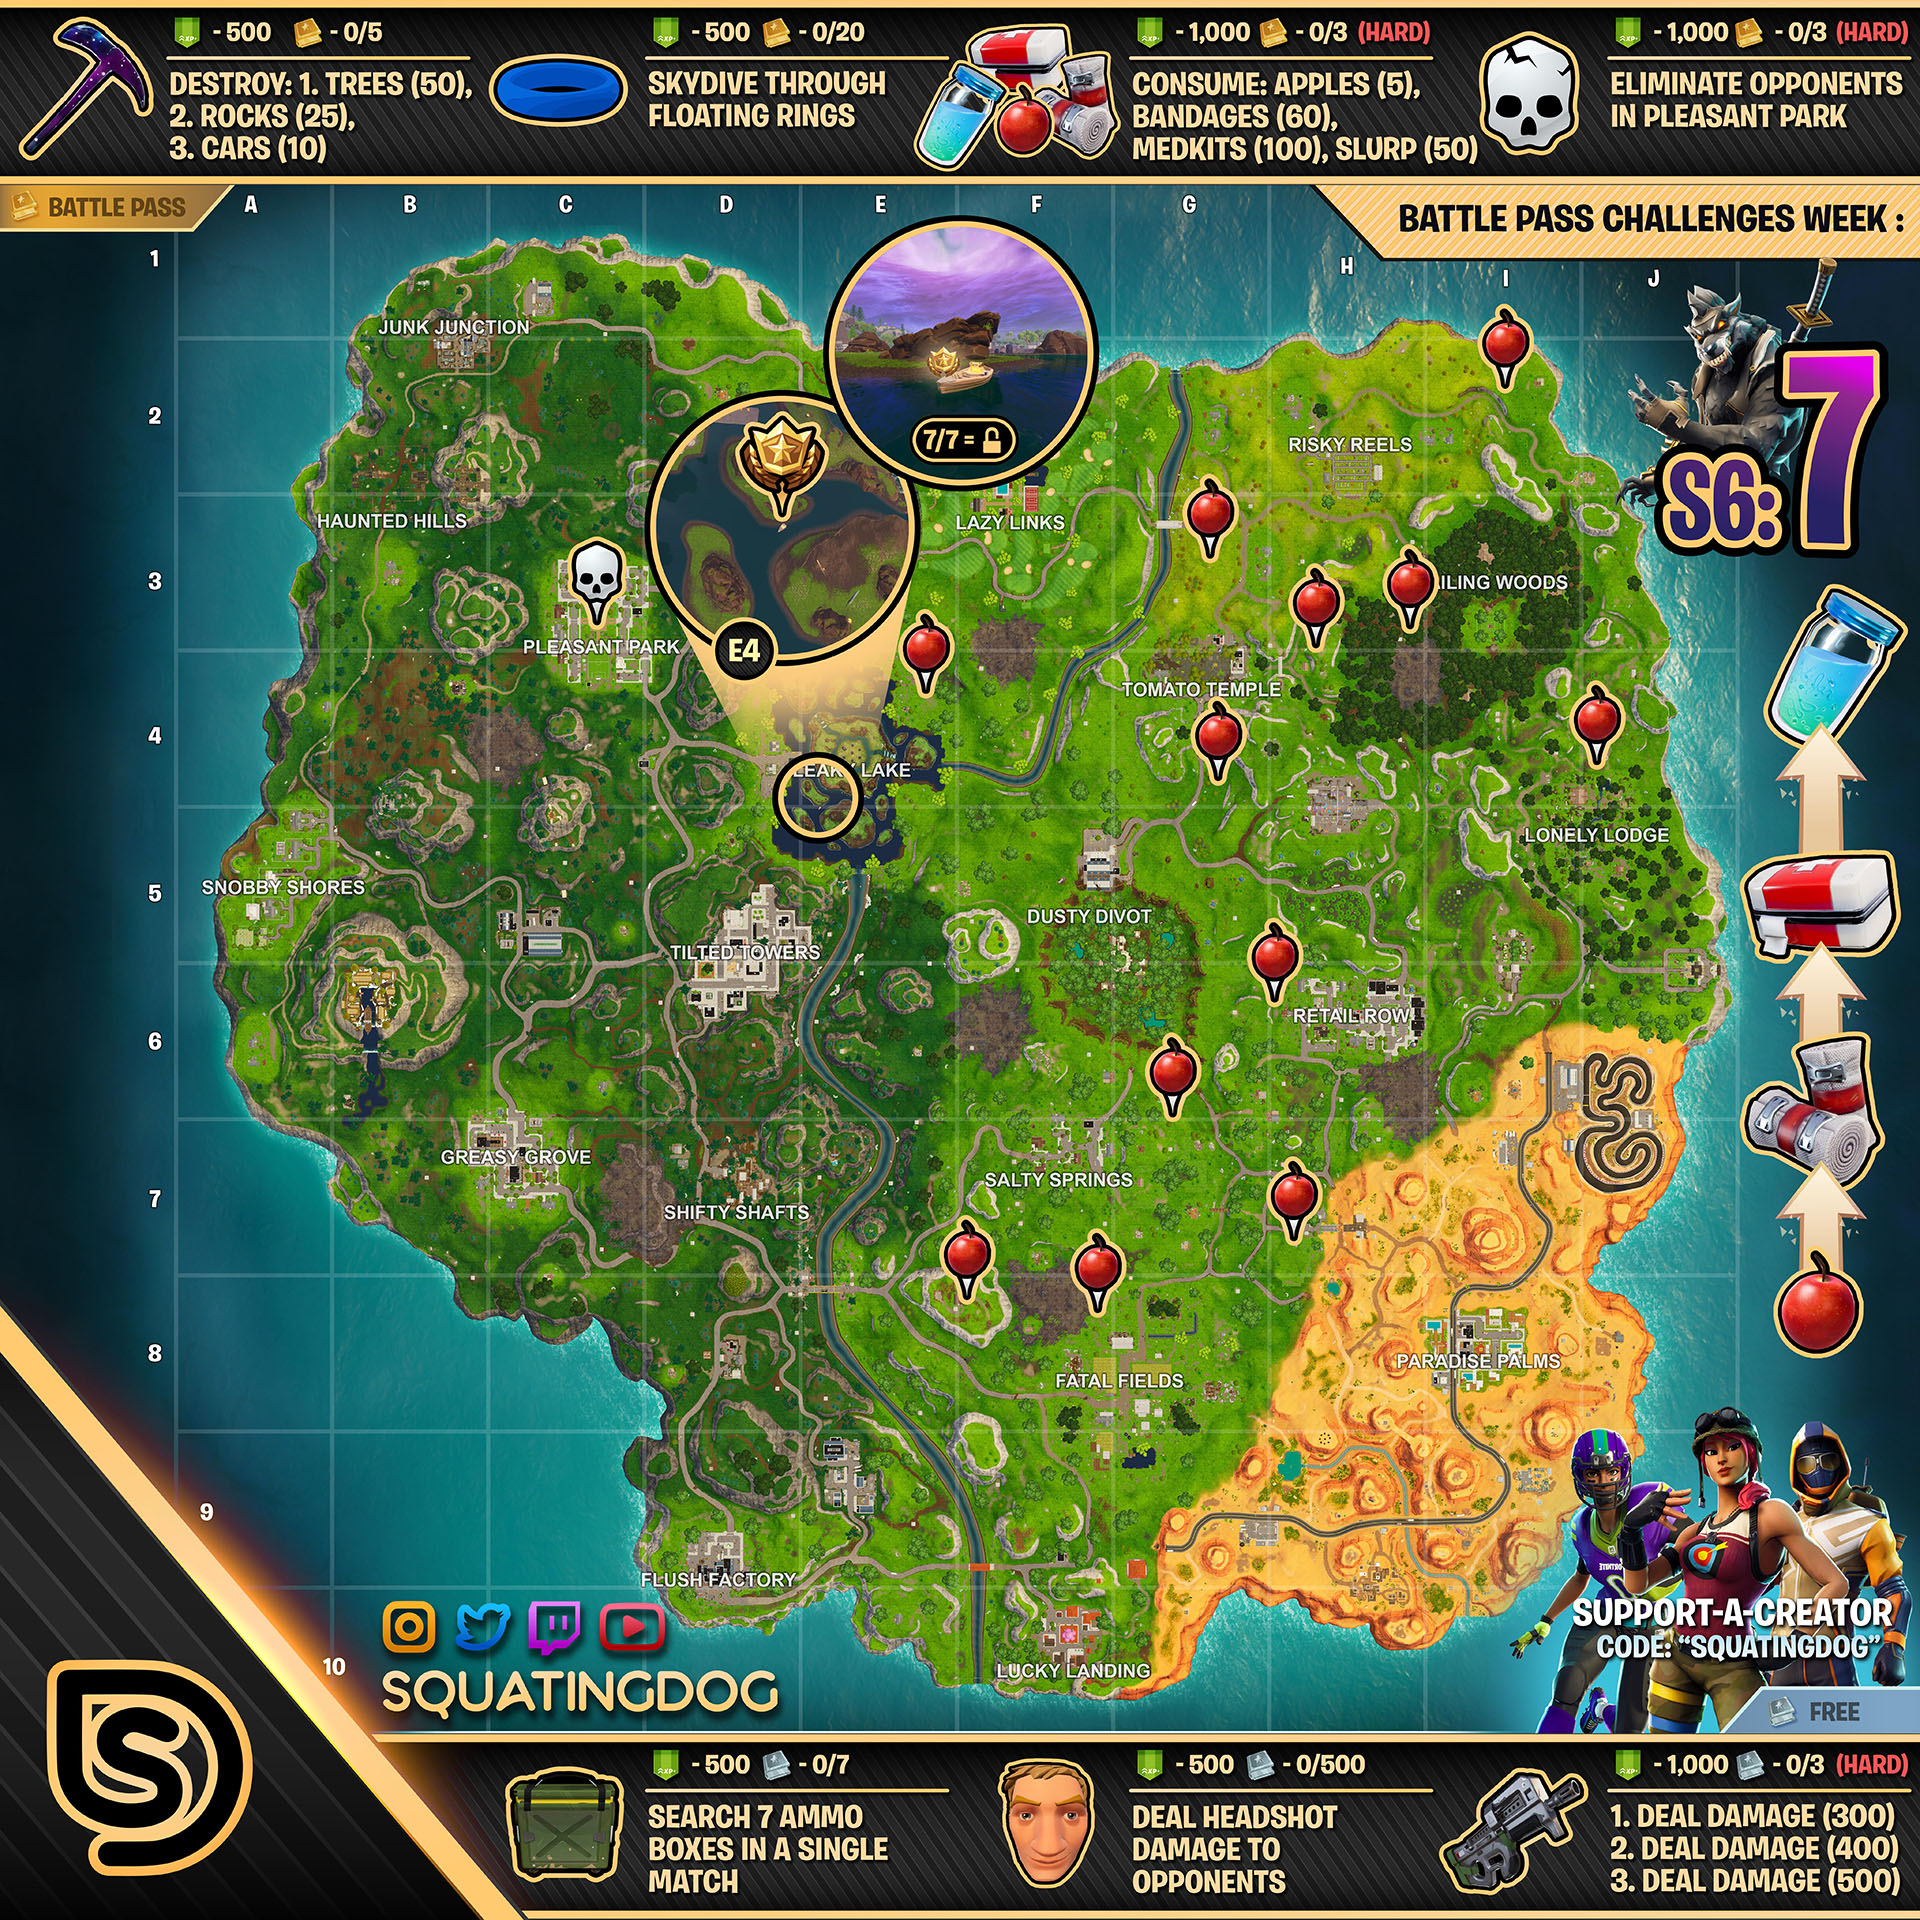 The Sims 4 Cheats, Codes, Cheat Codes, Walkthrough, Guide ...